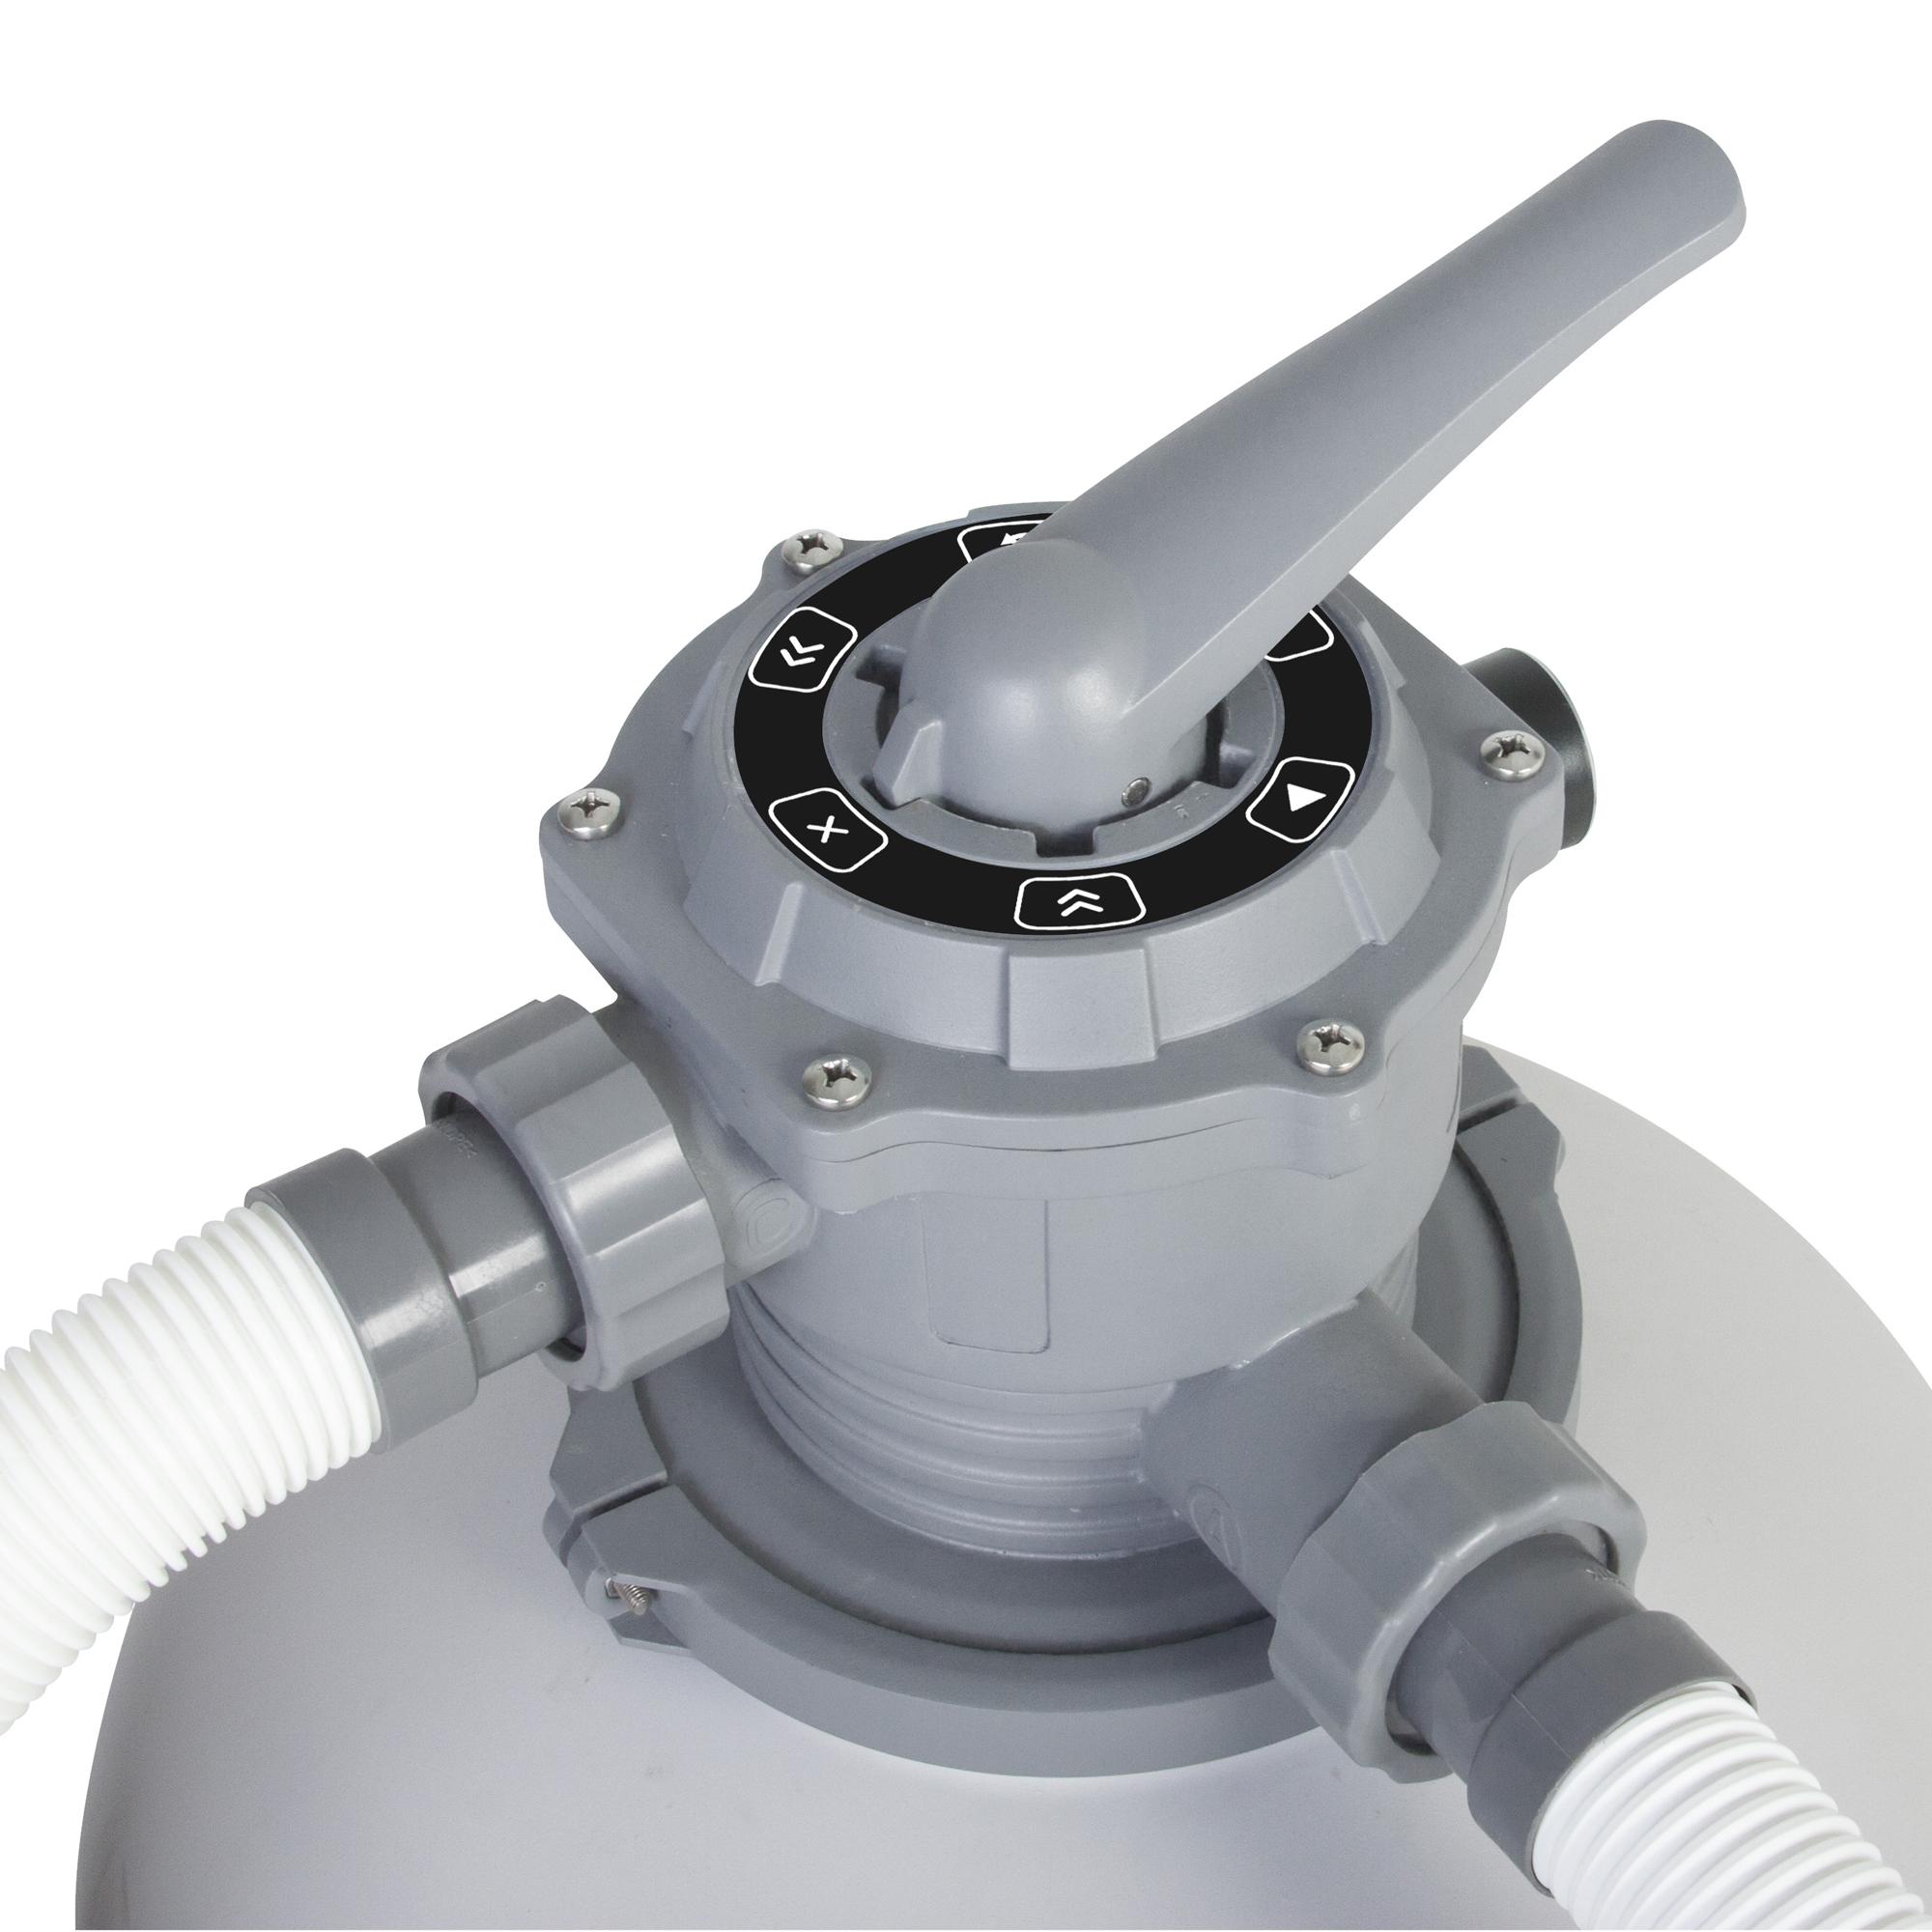 bestway flowclear sandfilterpumpe l h pool sand filter pumpe 2000gal ebay. Black Bedroom Furniture Sets. Home Design Ideas